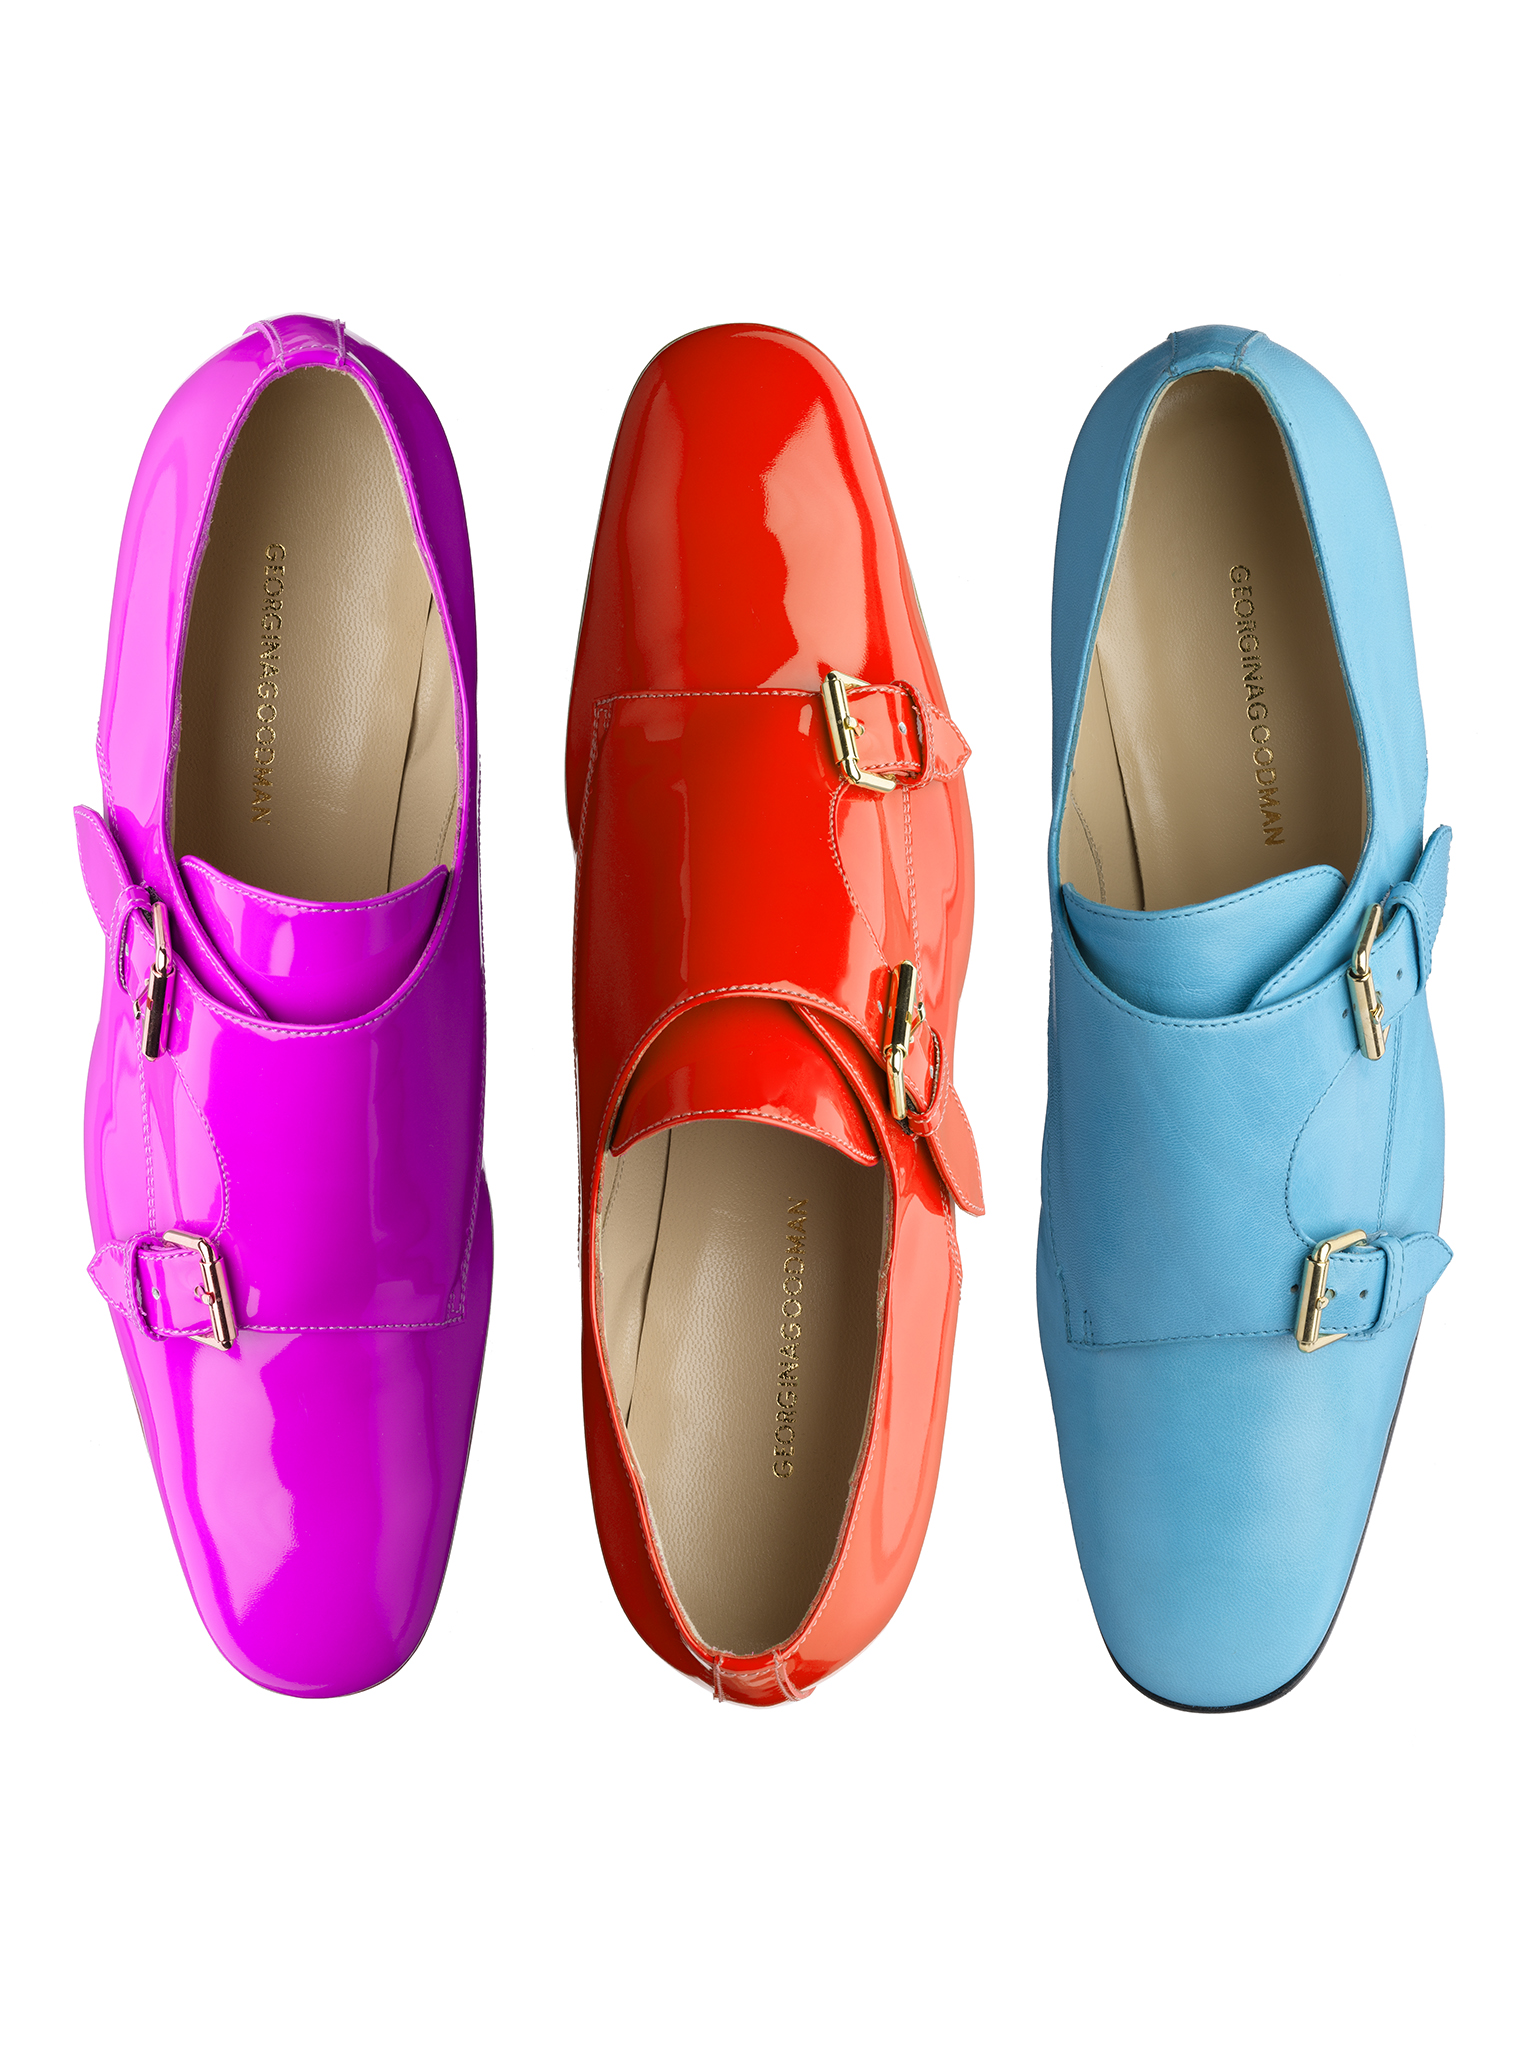 130 GEORGINA GOODMAN leather shoes _BL-web.jpg